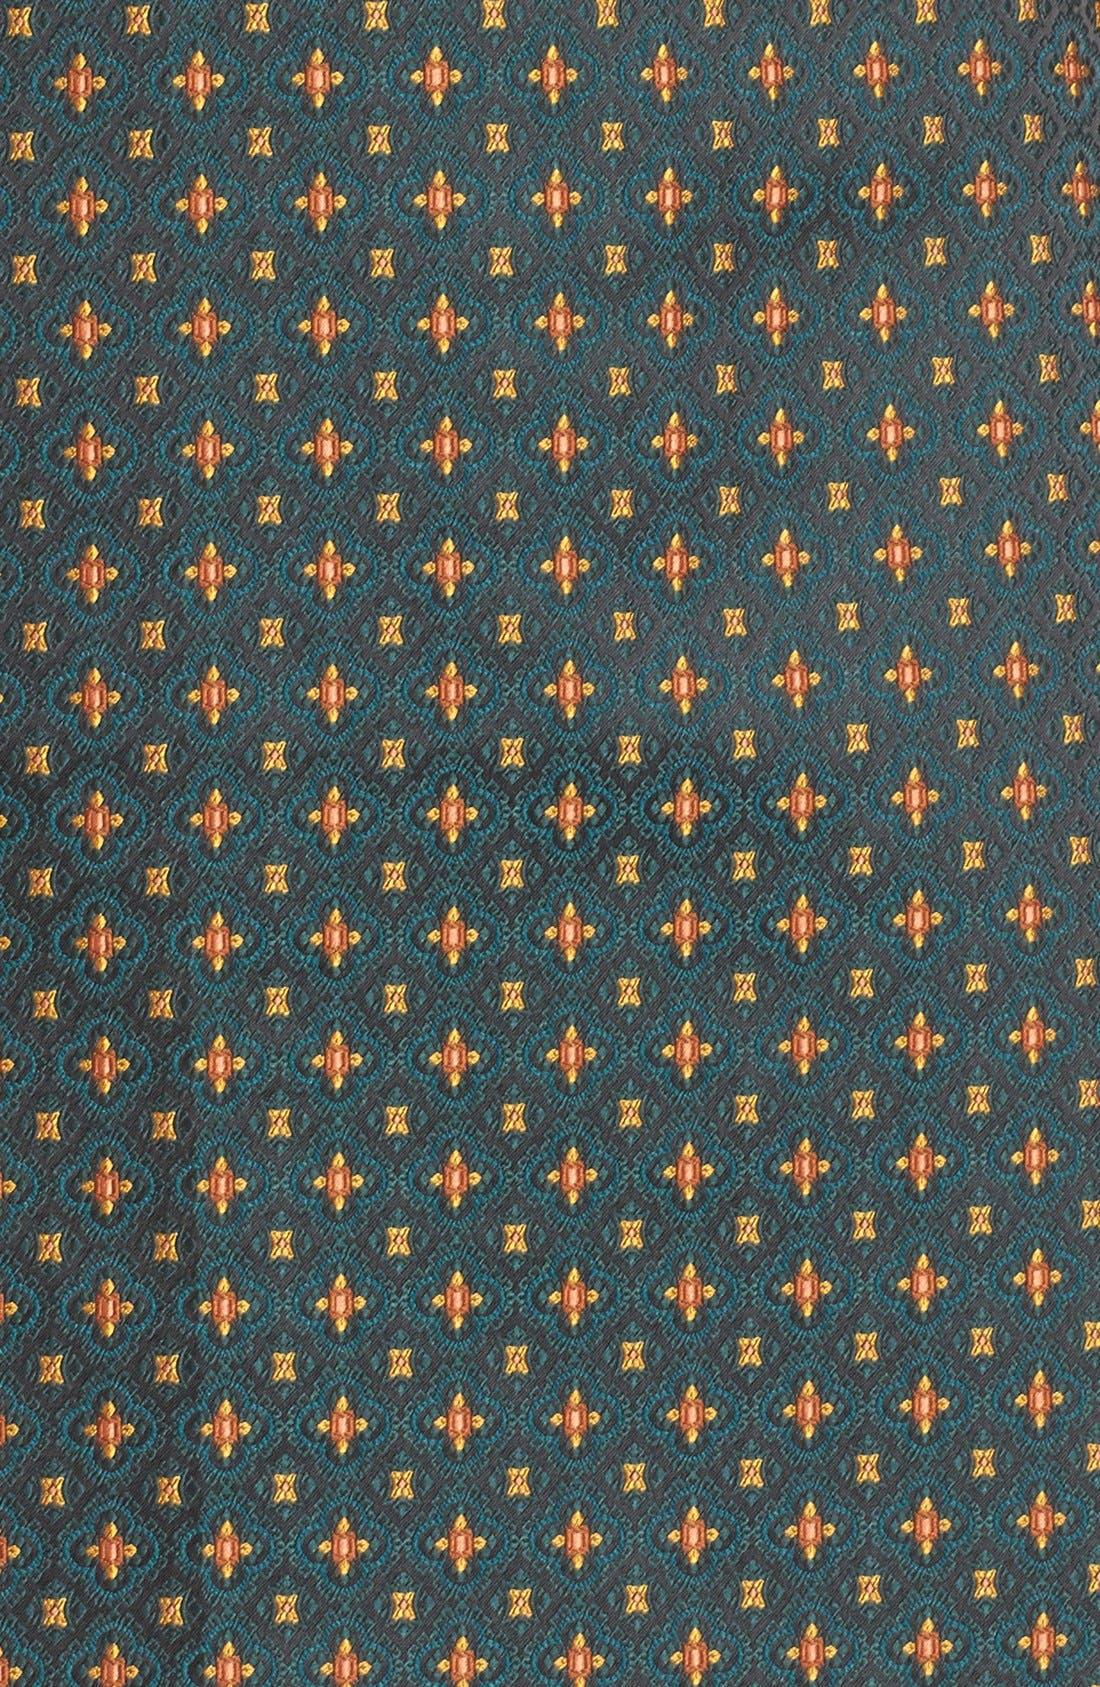 Jacquard A-Line Skirt,                             Alternate thumbnail 2, color,                             310